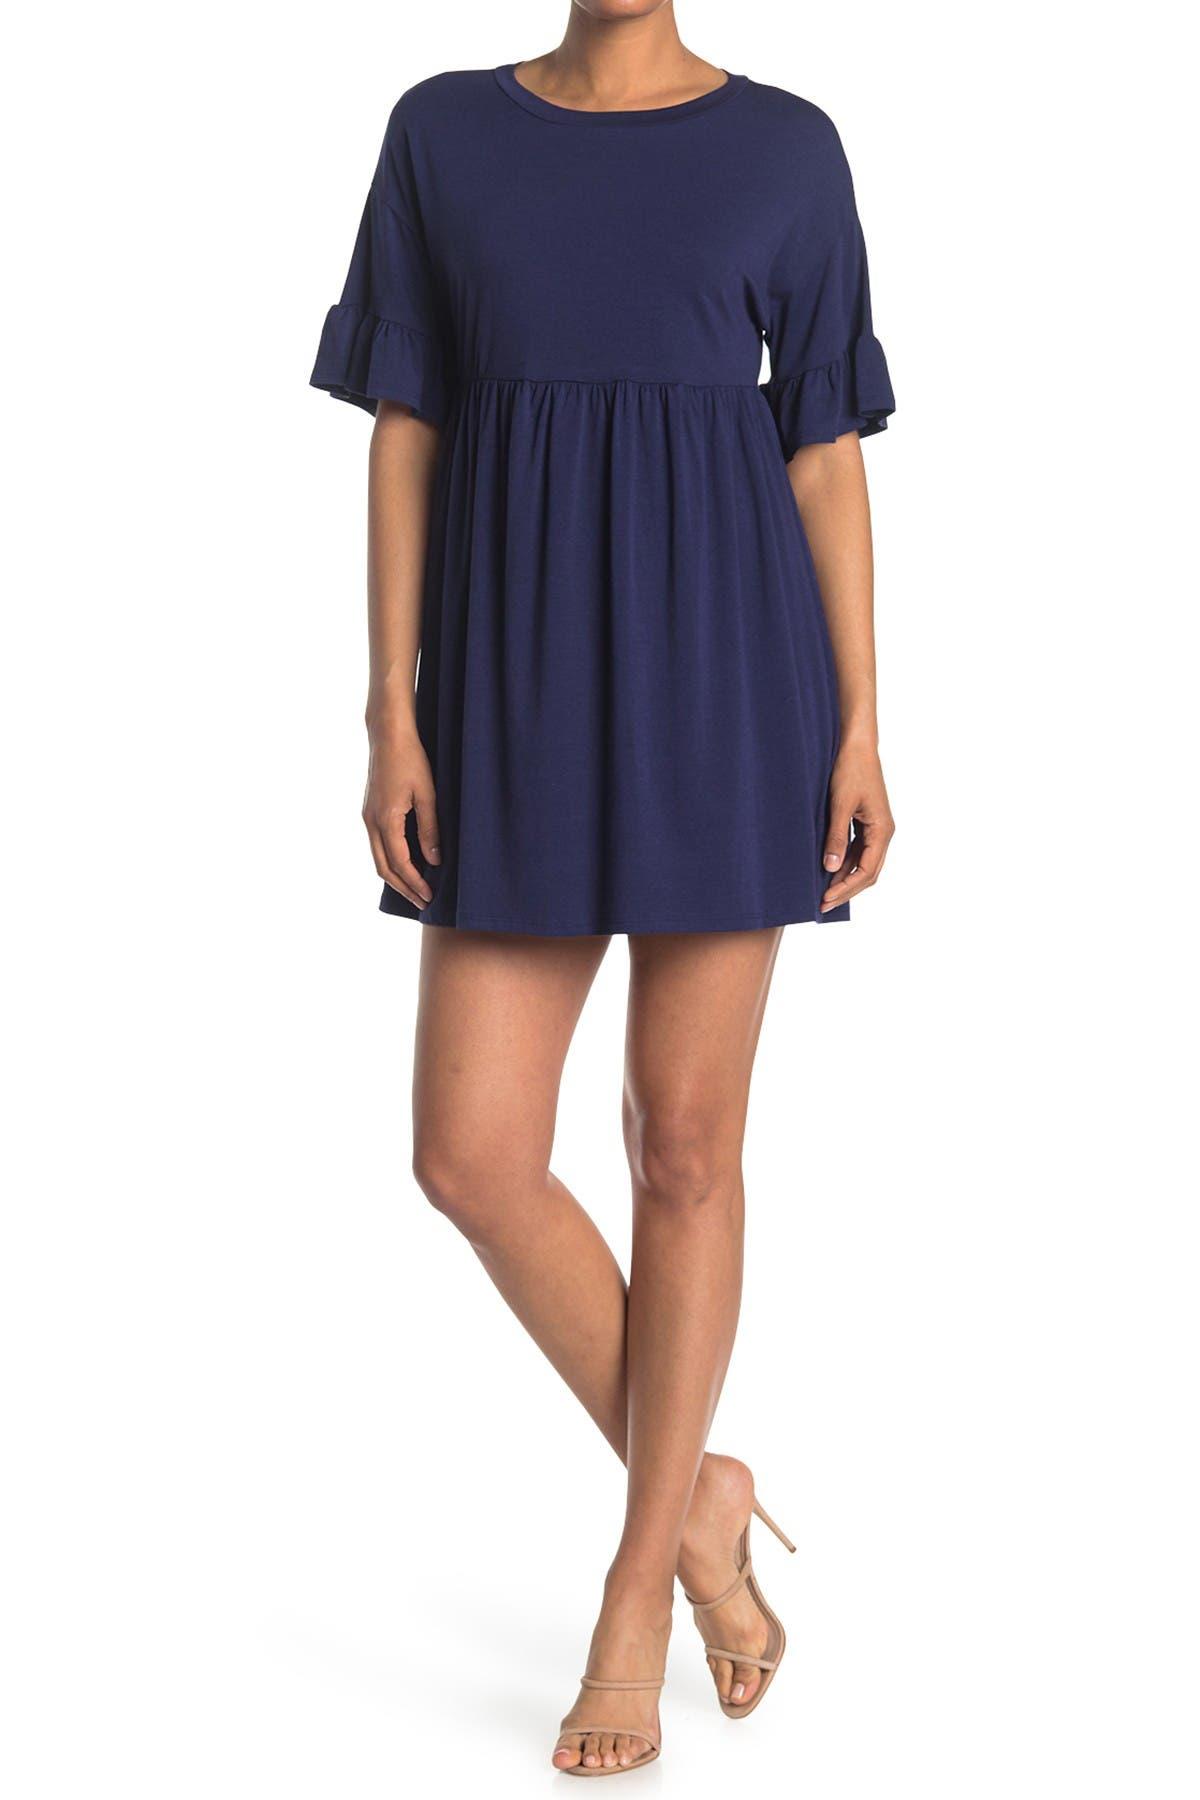 Image of KENEDIK Ruffle Sleeve Babydoll T-Shirt Dress